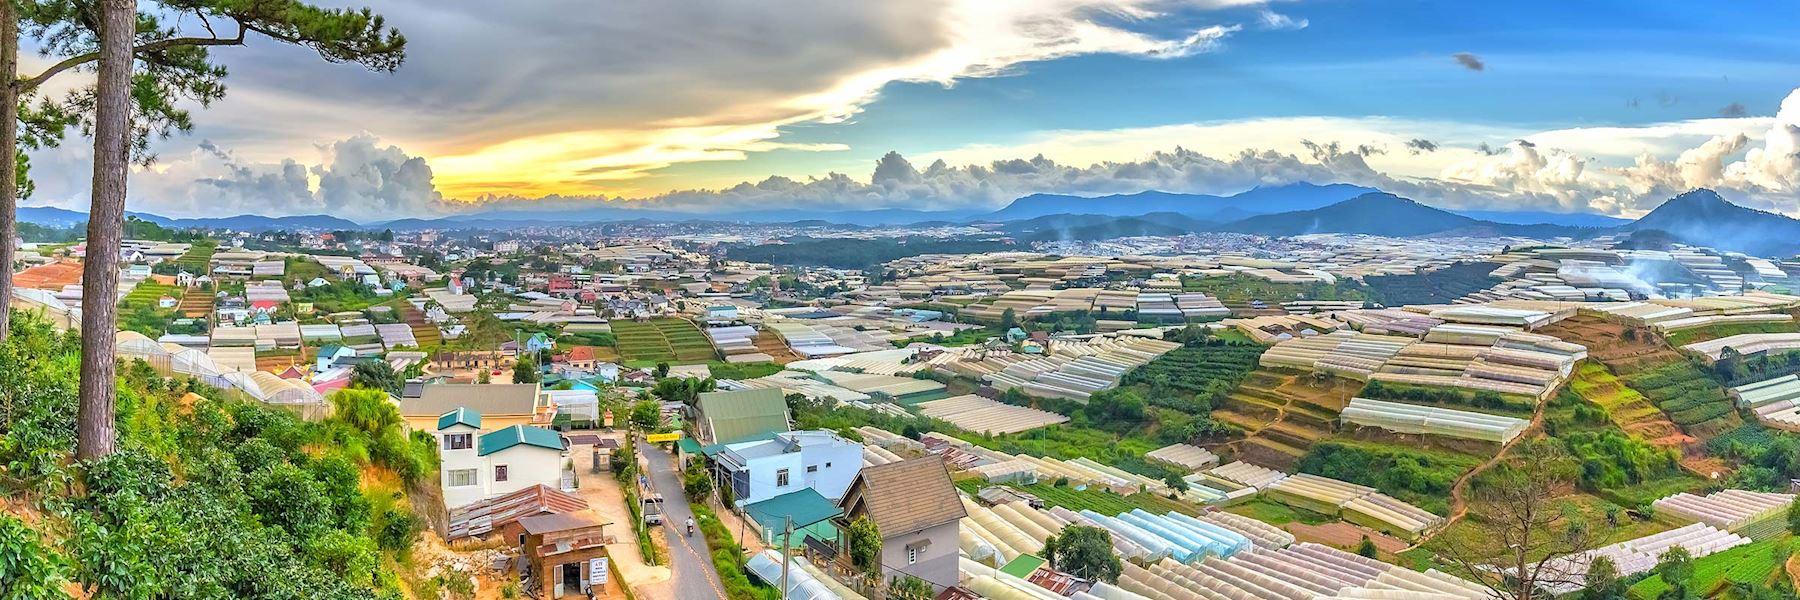 Visit Dalat, Vietnam